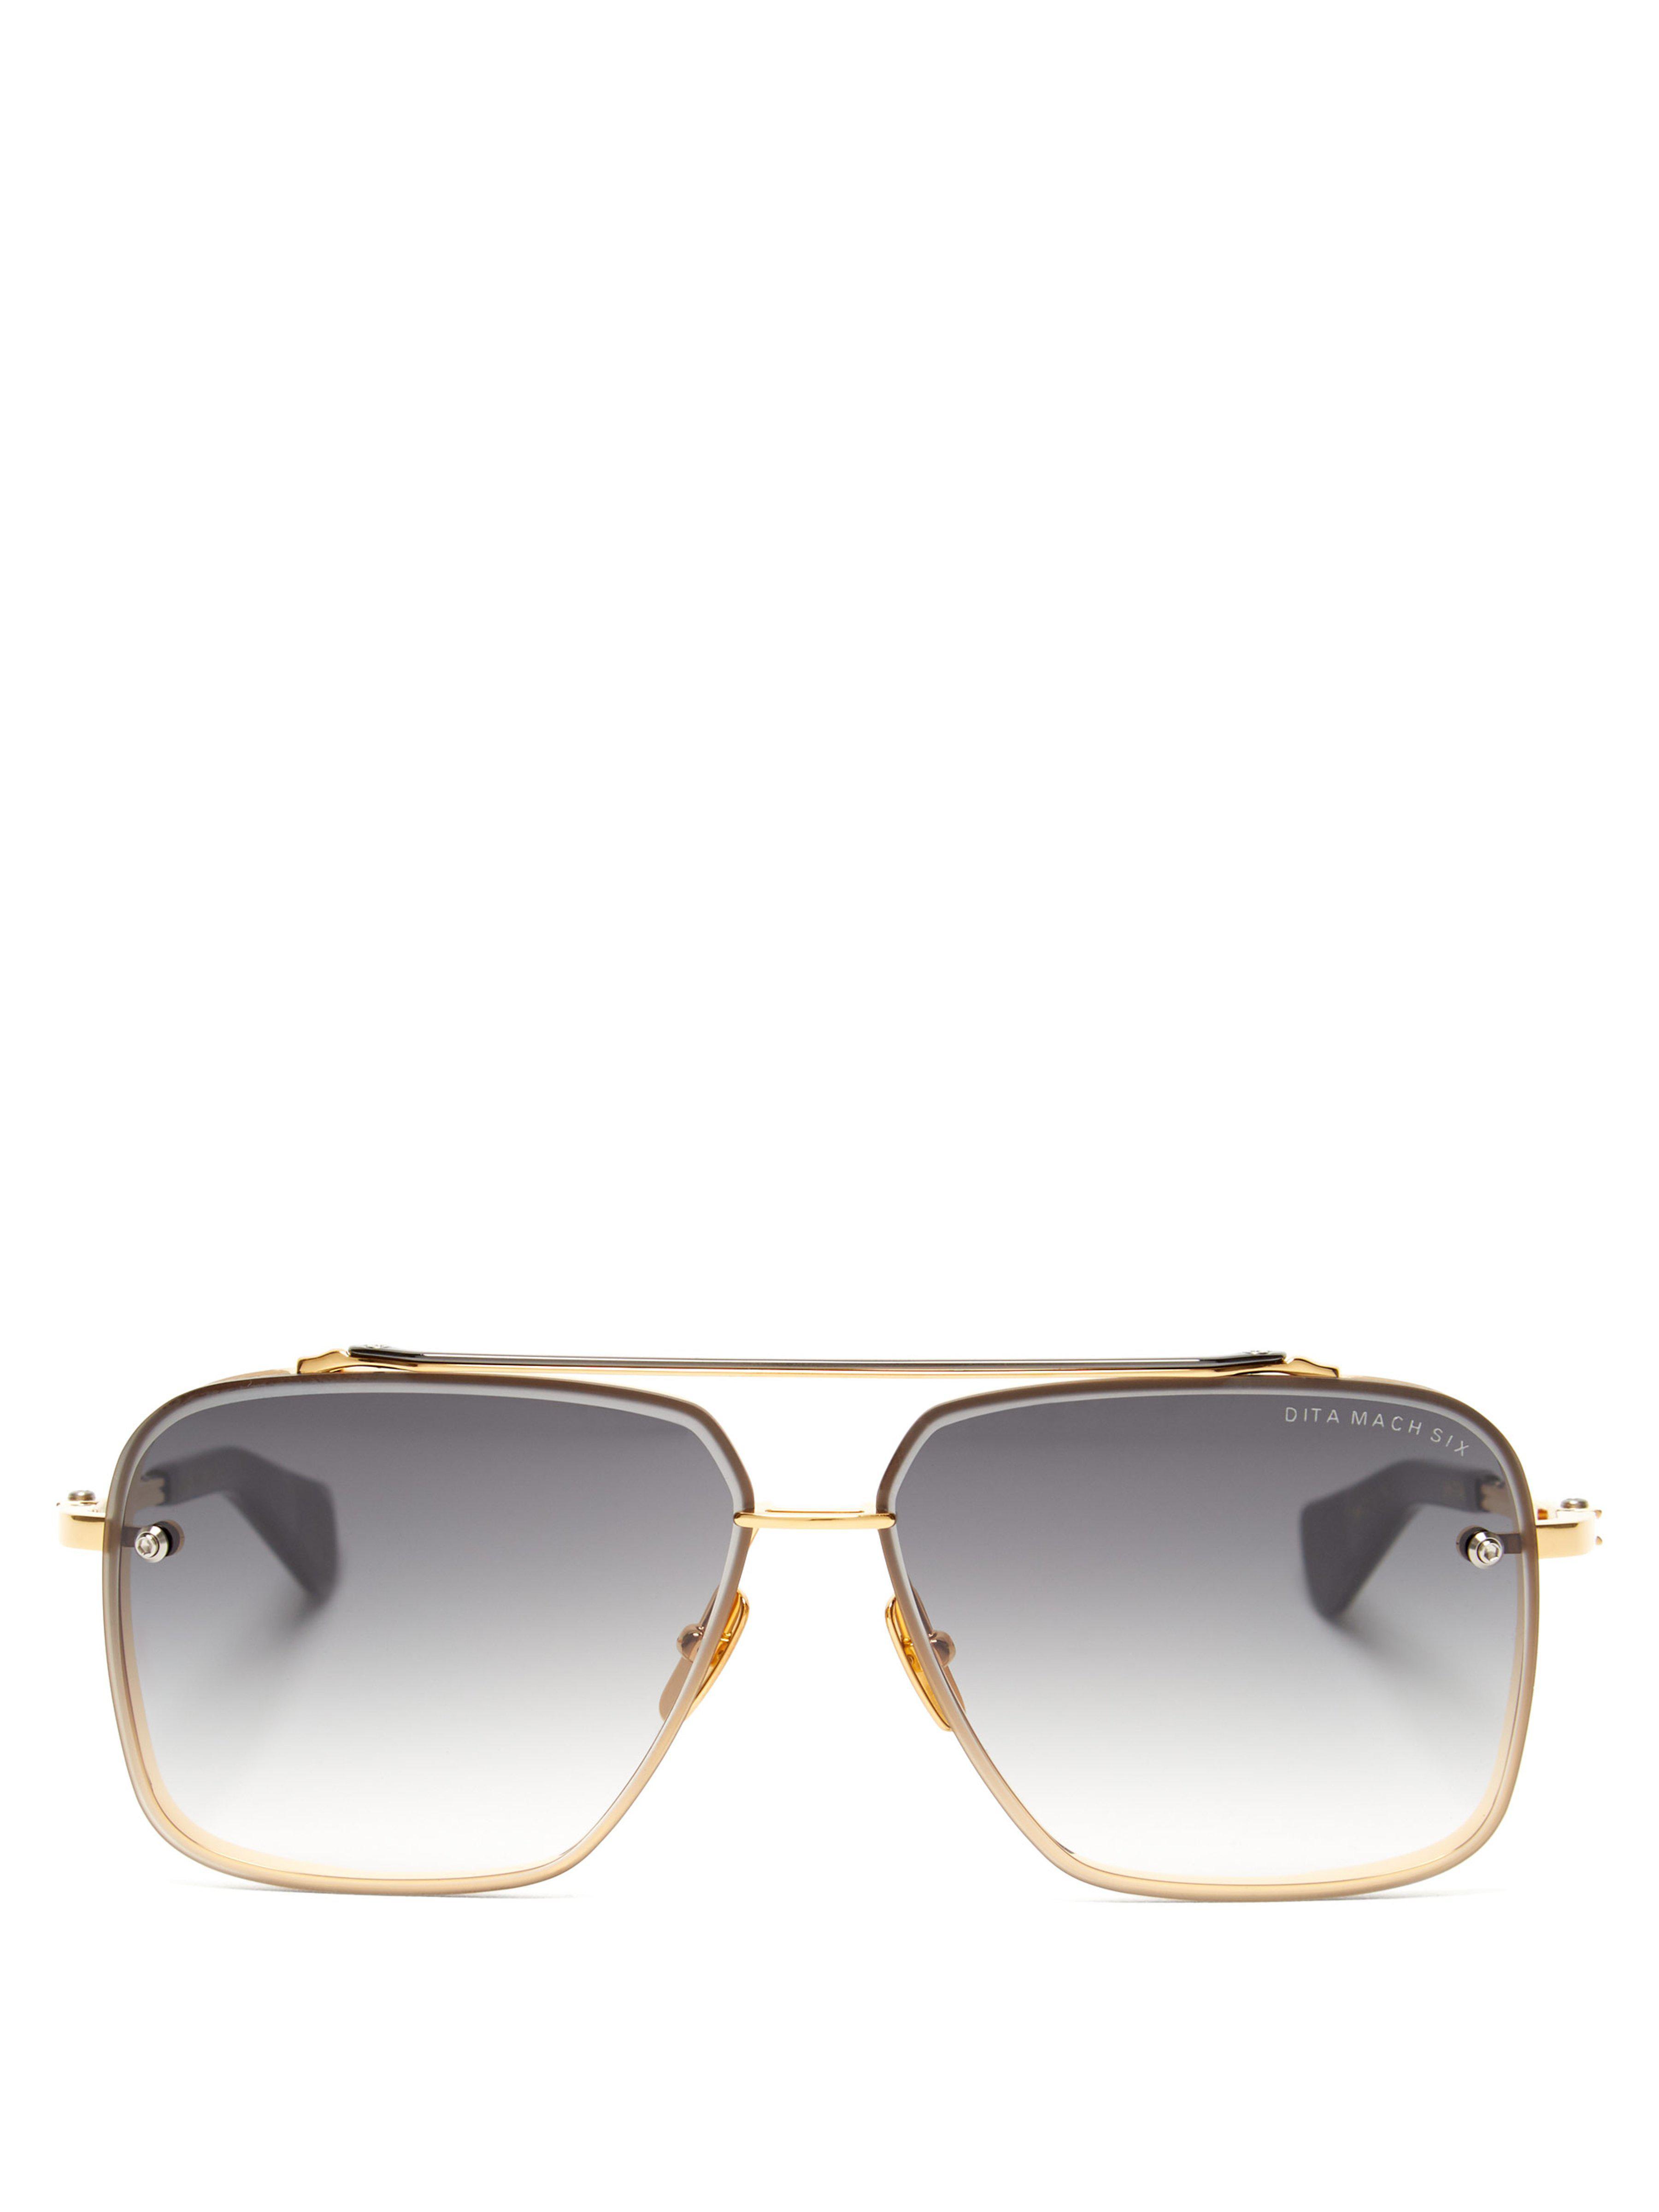 3b907cf6019 Dita Eyewear Mach Six Aviator Sunglasses in Metallic for Men - Lyst